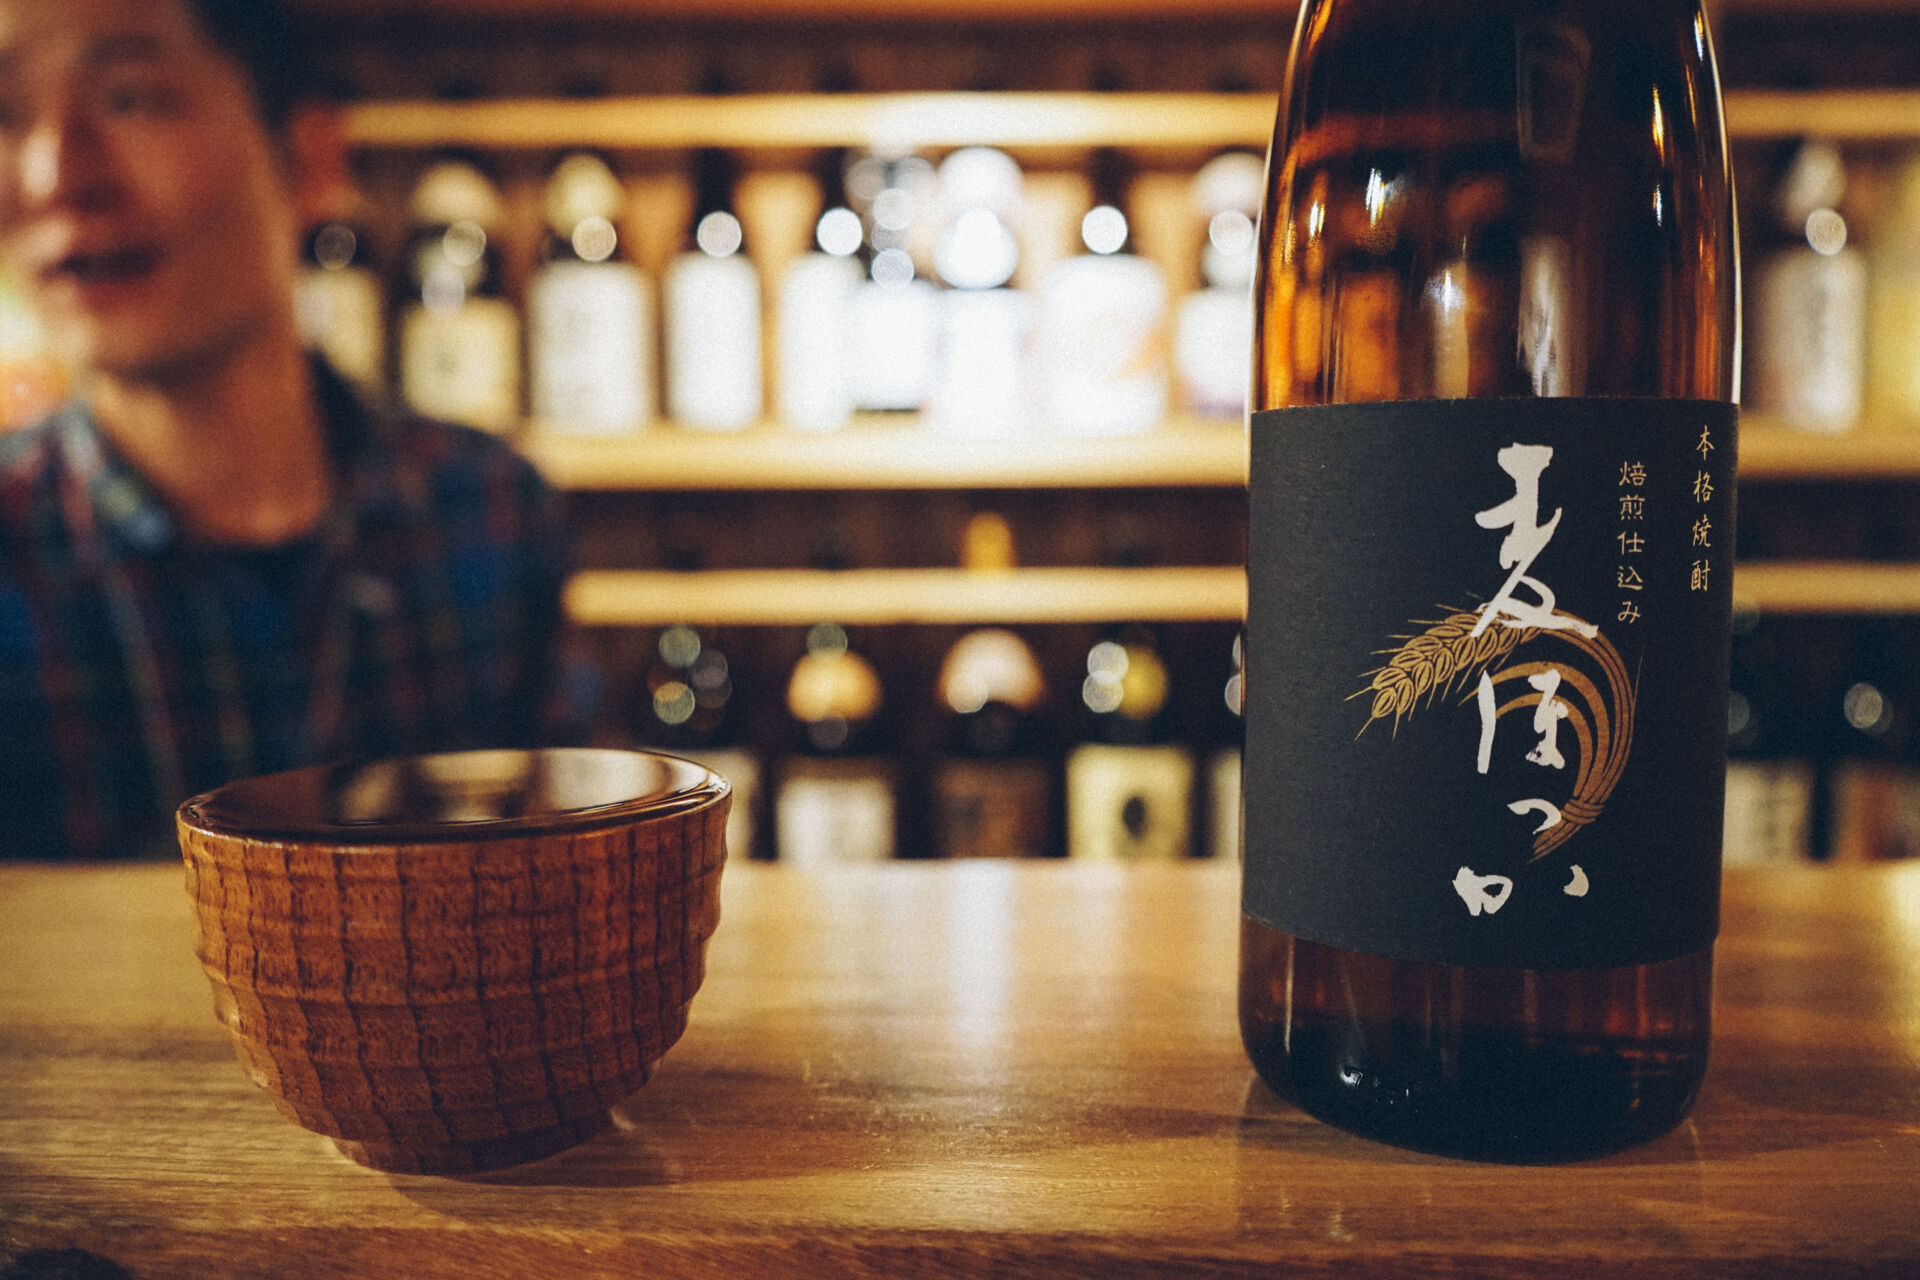 Discover the shōchū in good company